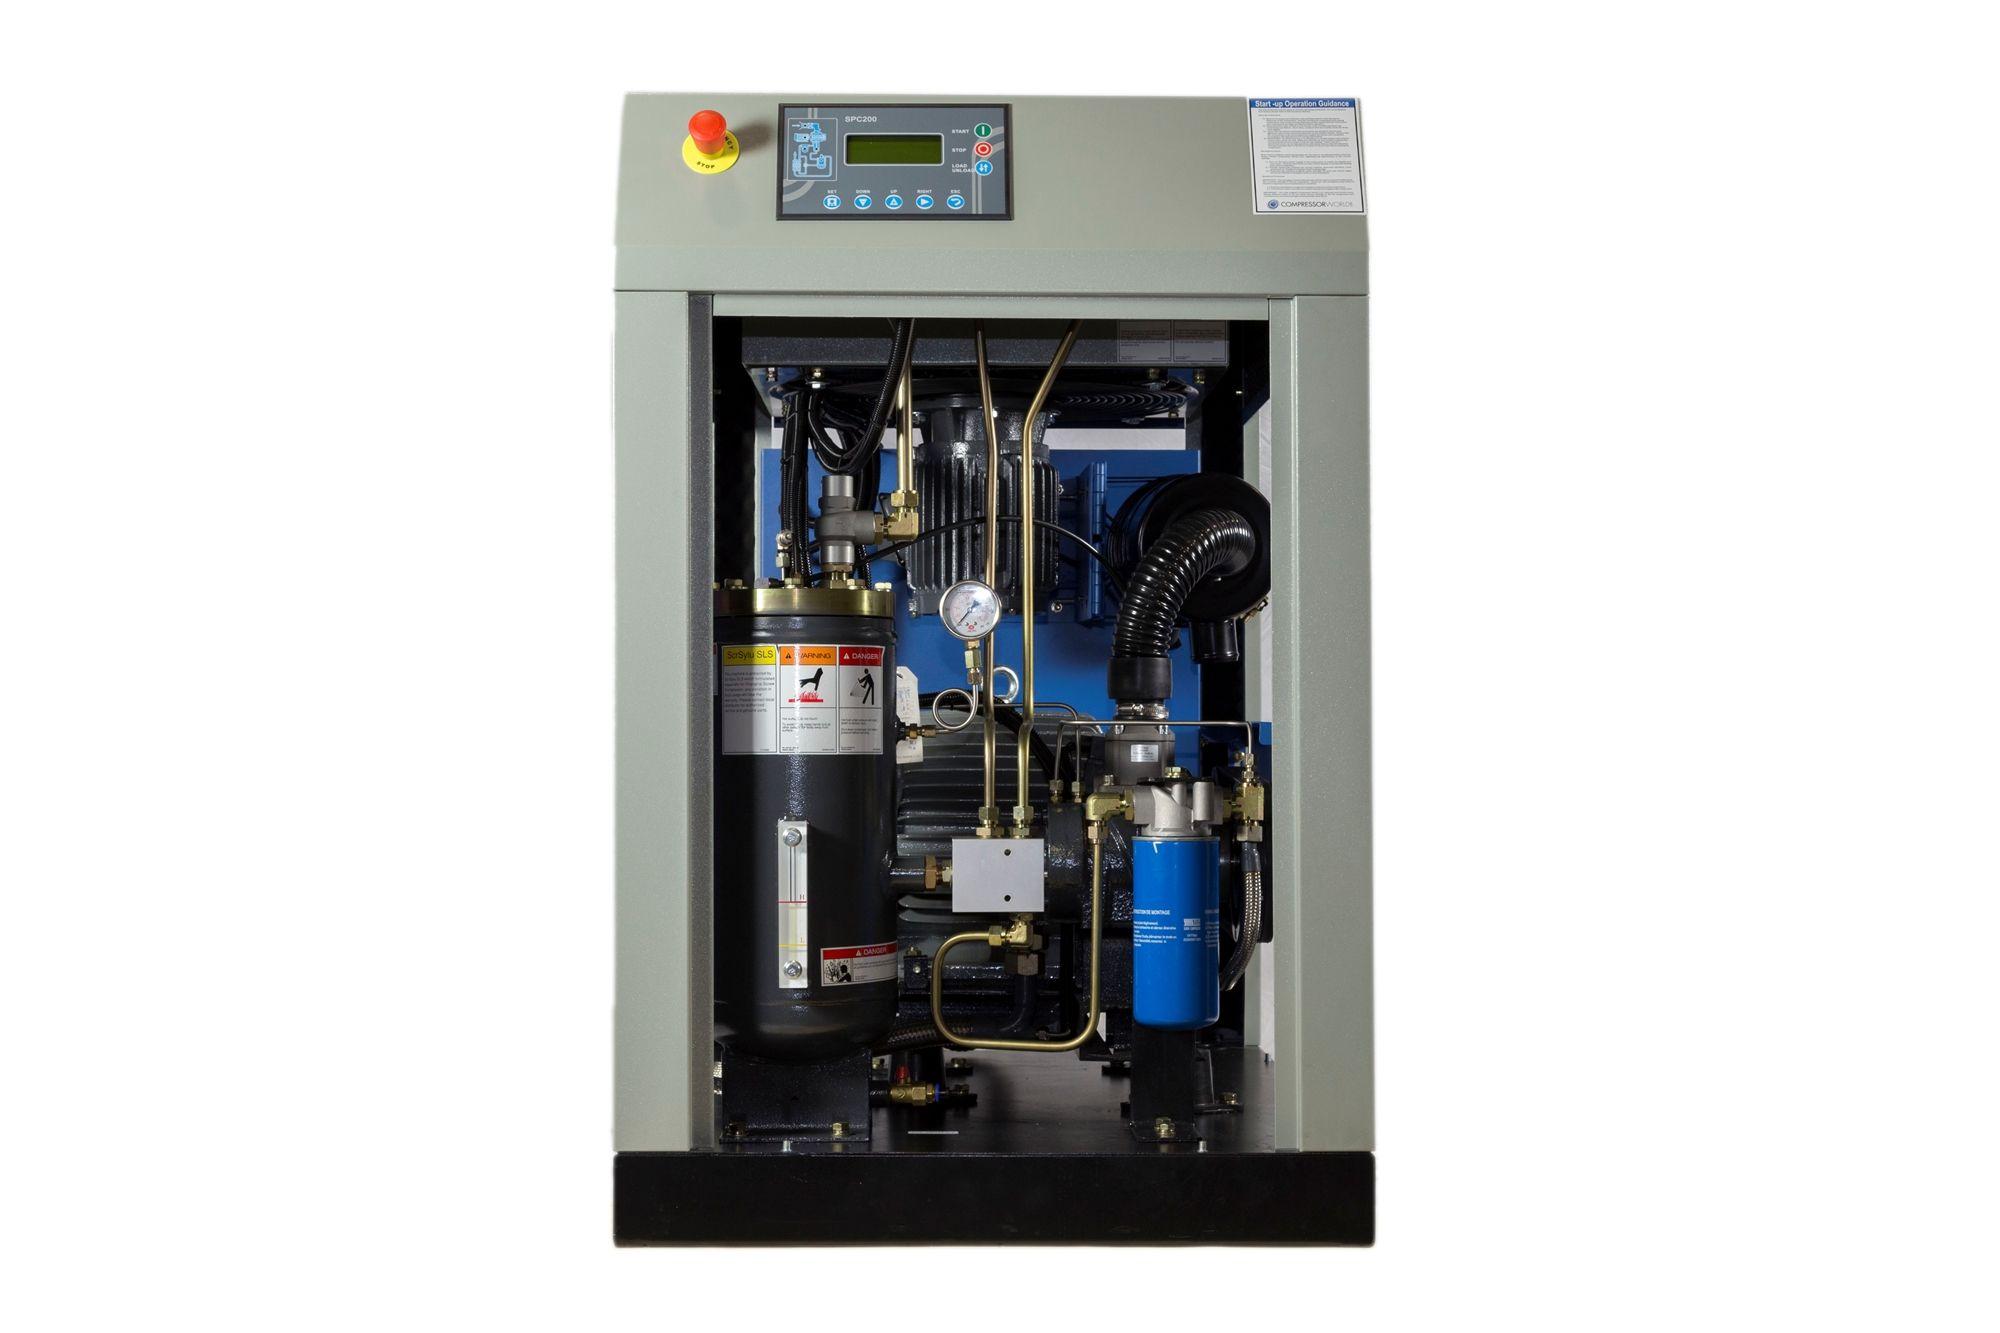 25 Hp Rotary Screw Air Compressors 25 Horsepower 100 Cfm Air Compressor Compressors Locker Storage